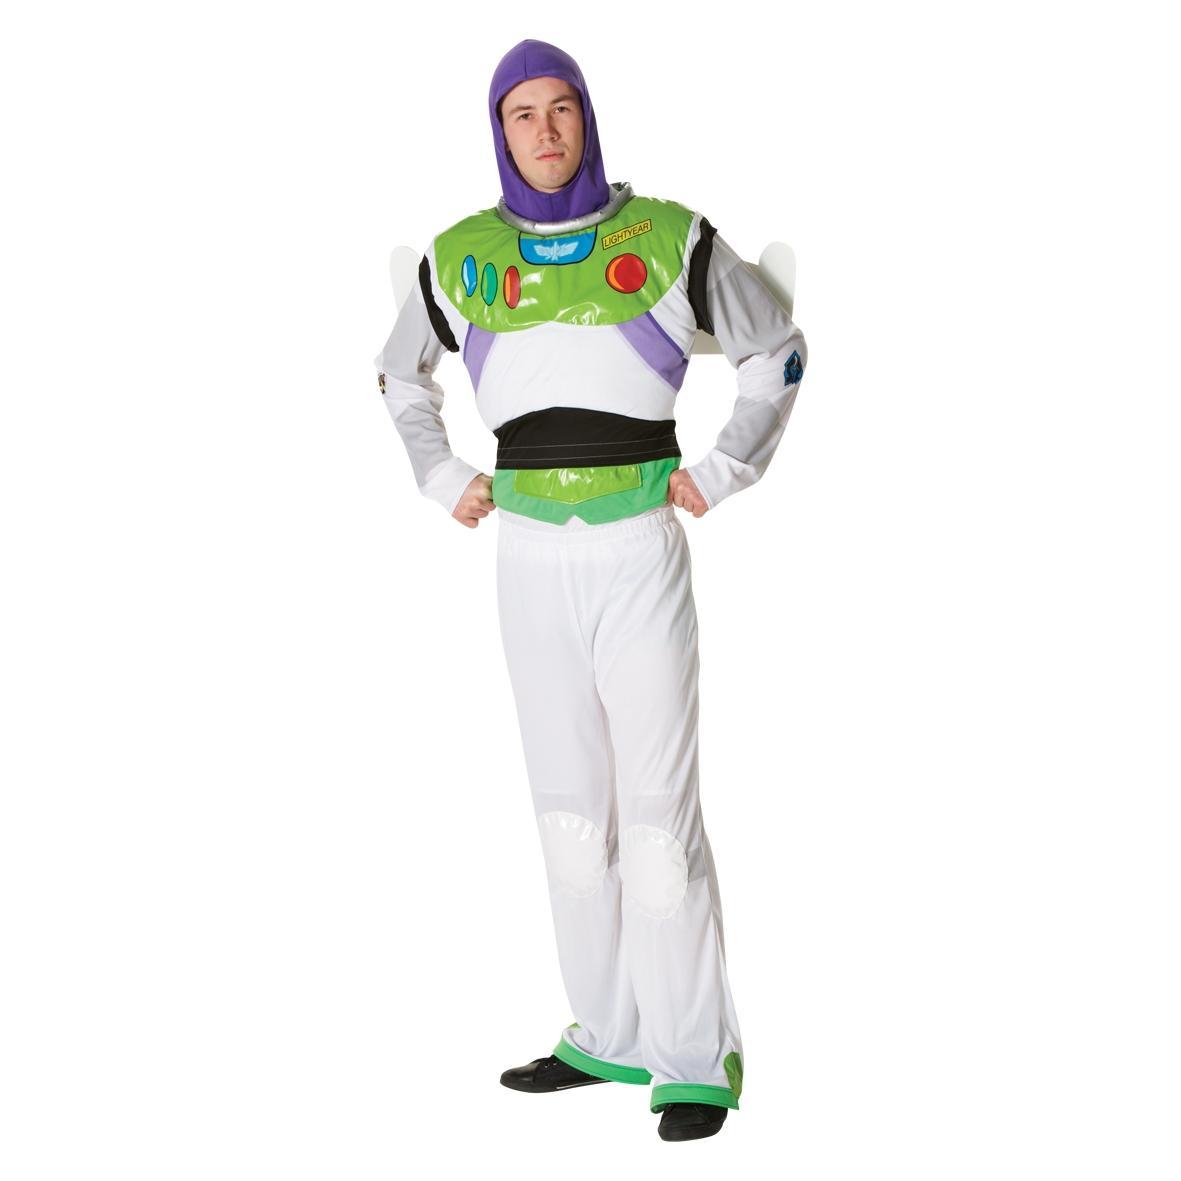 Buzz Lightyear Maskeraddräkt